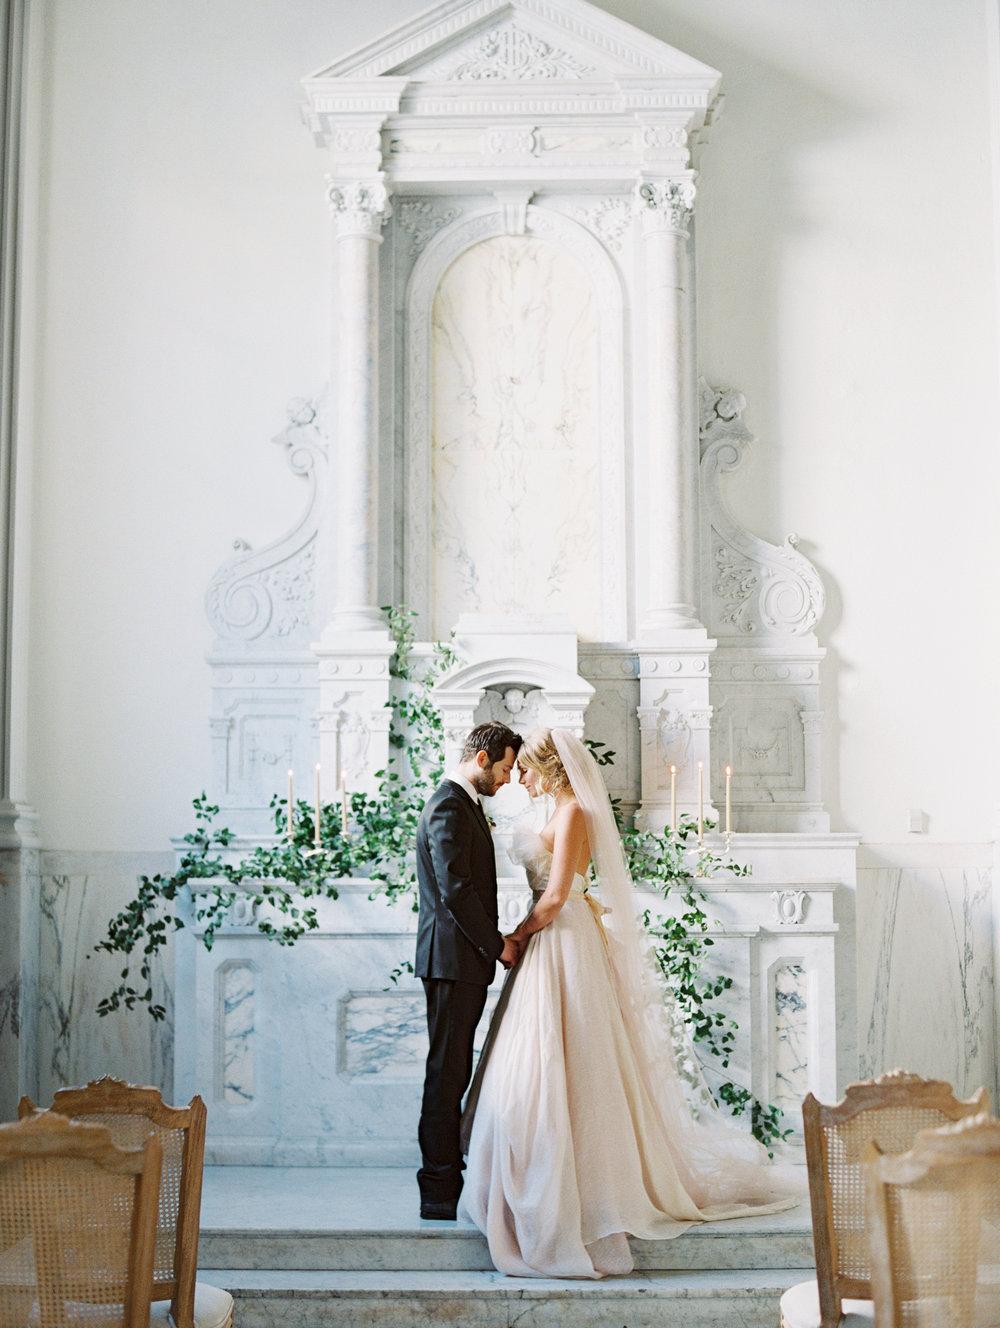 Carol Hannah Bridal Grand Palais Gown VibianabyValentinaGlidden_186.jpg